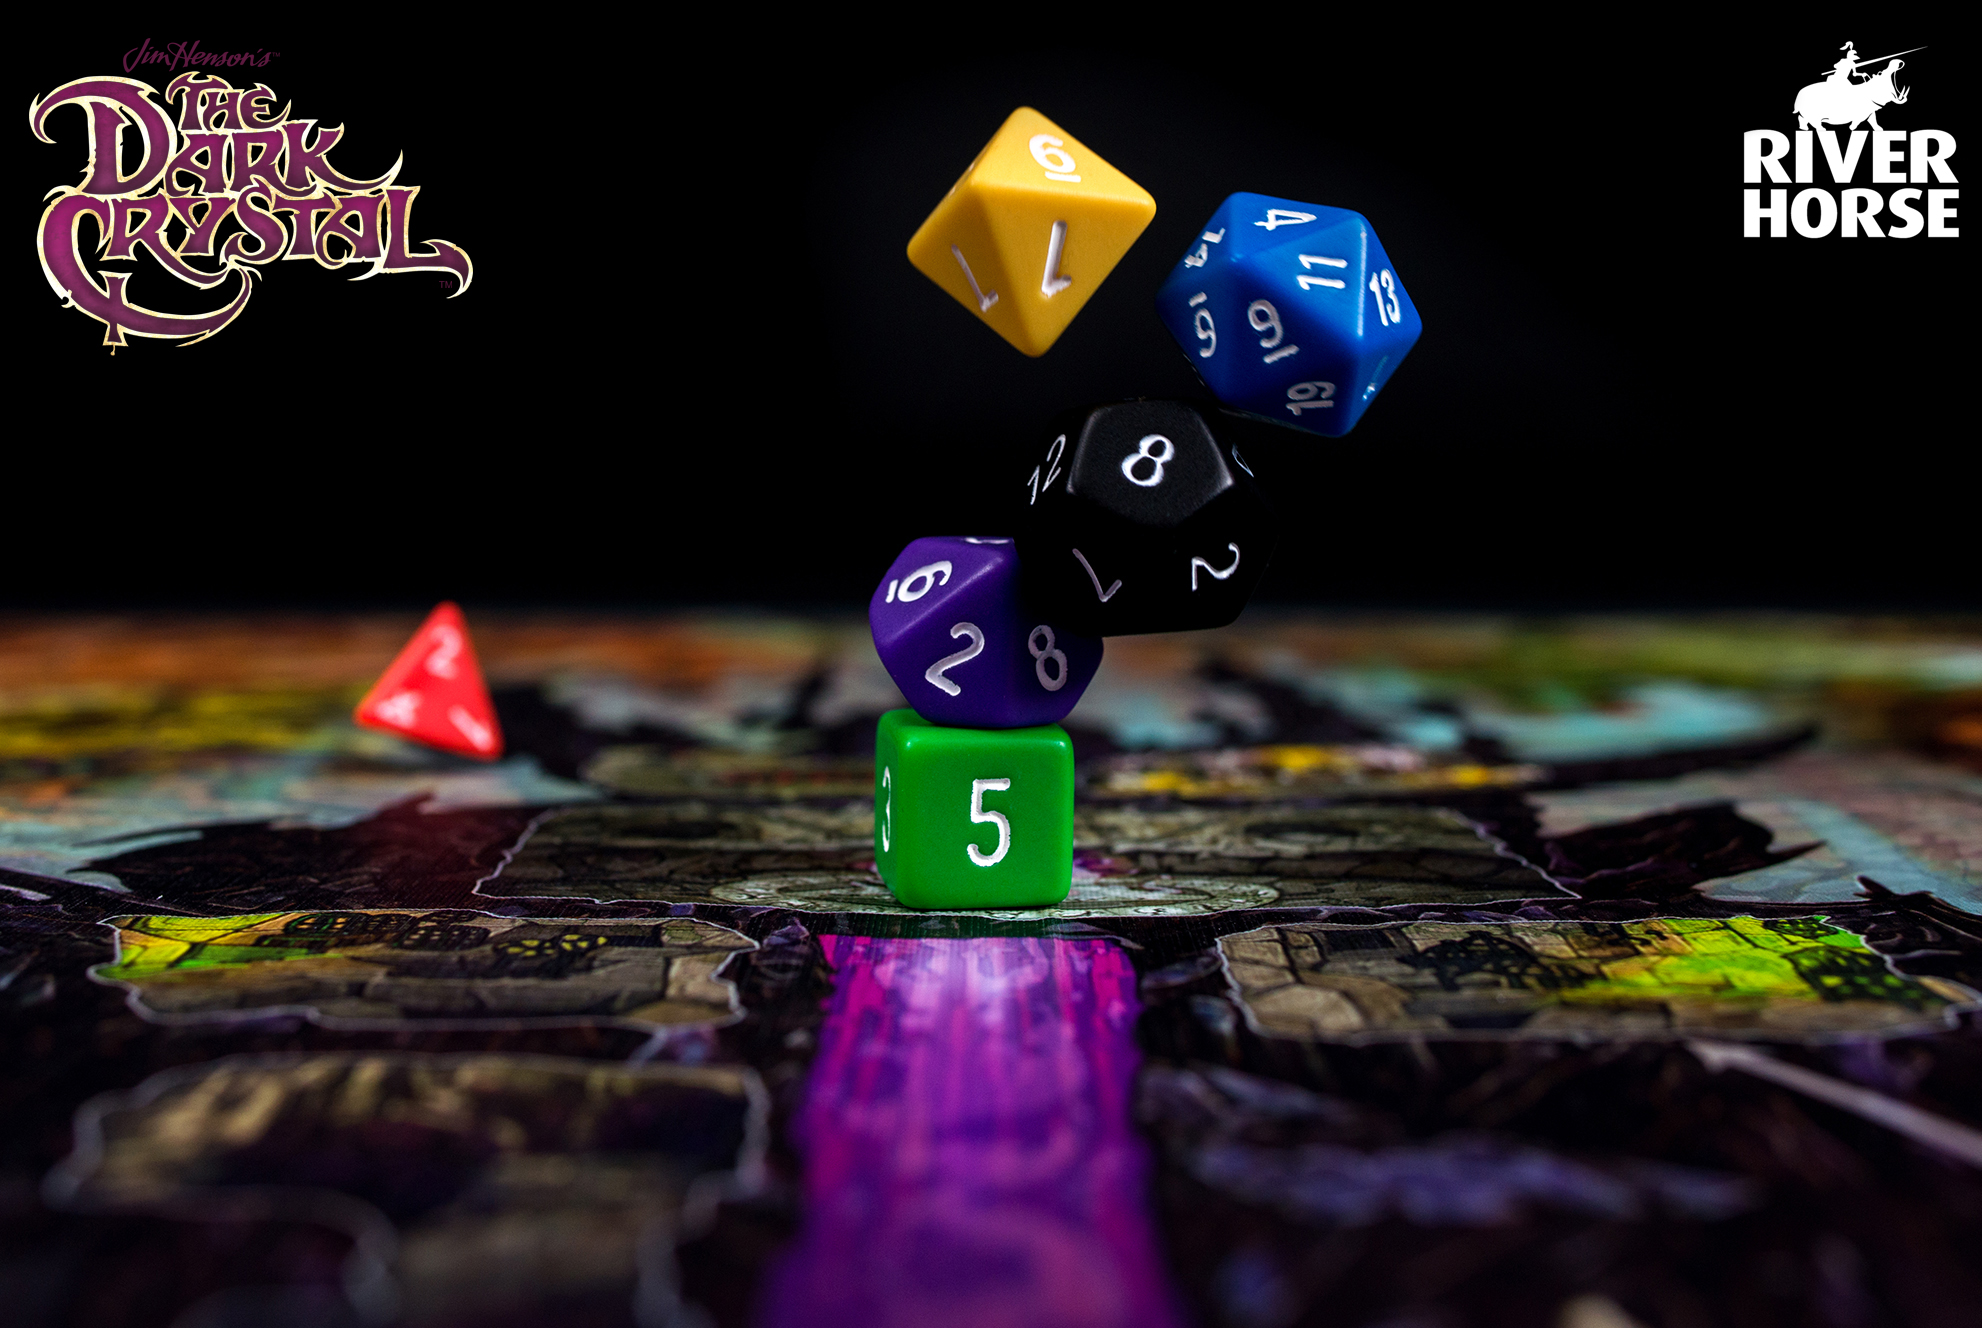 River Horse Studios Jim Hensons The Dark crystal Board Game